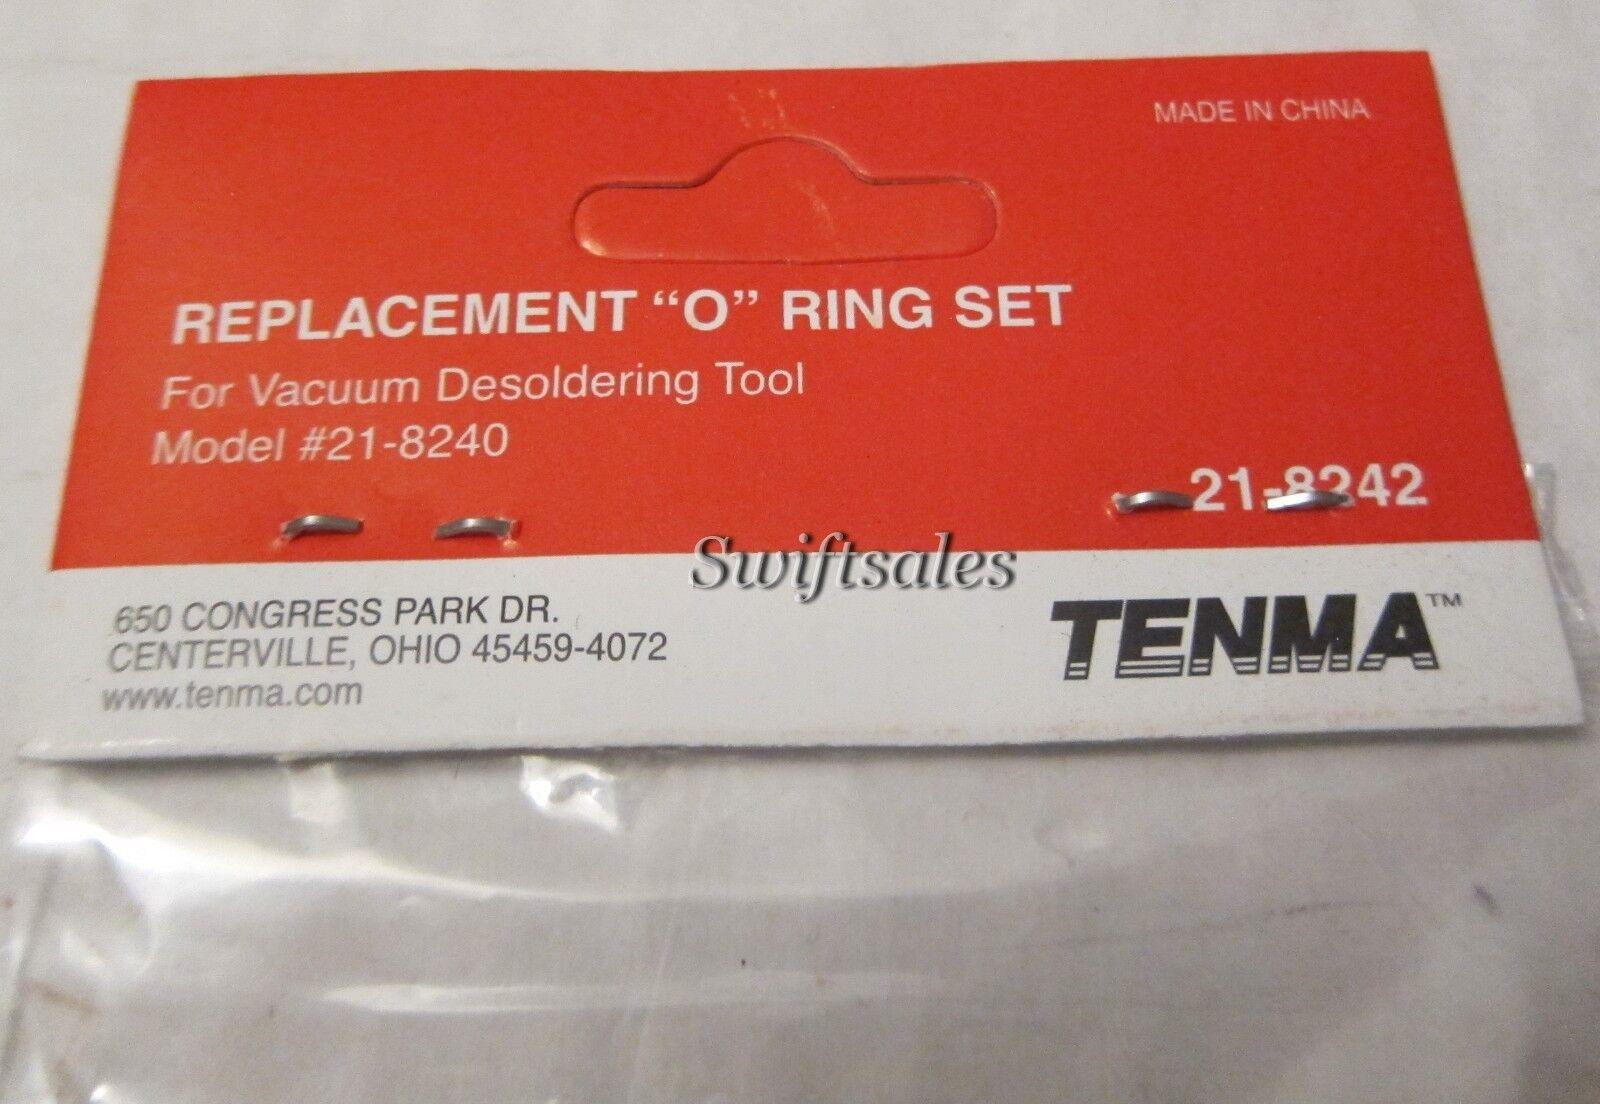 55 x 2 DIN 3770 ID x cross,mm variable pack EU origin material O-ring